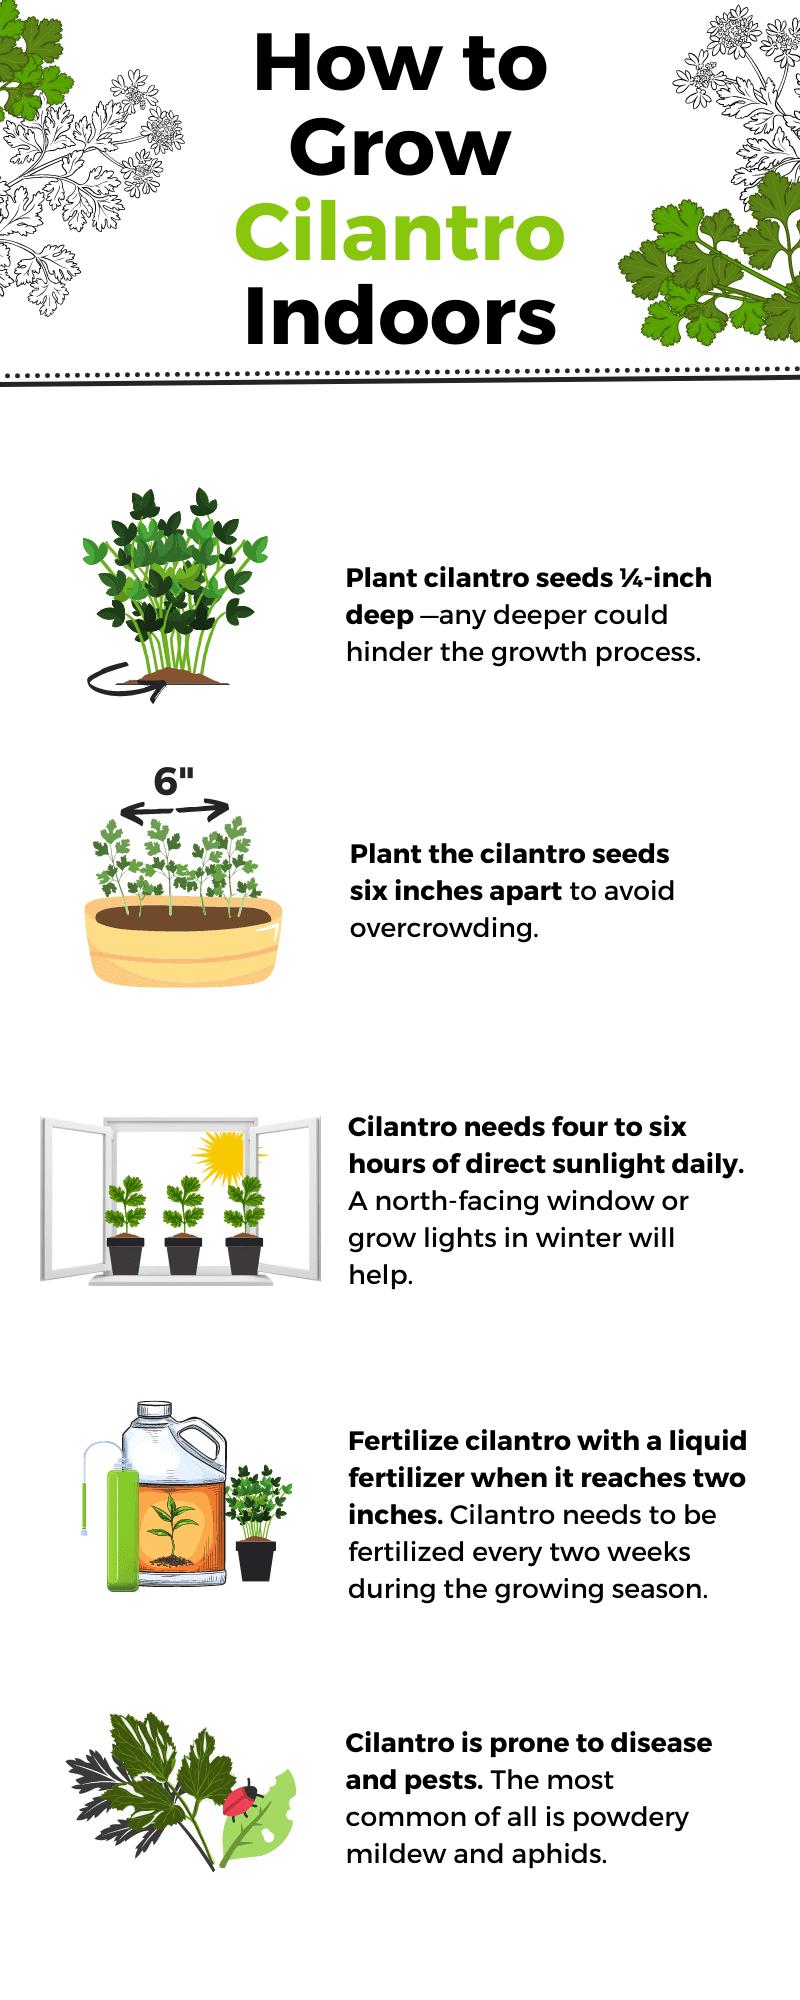 How to Grow Cilantro Indoors infographic